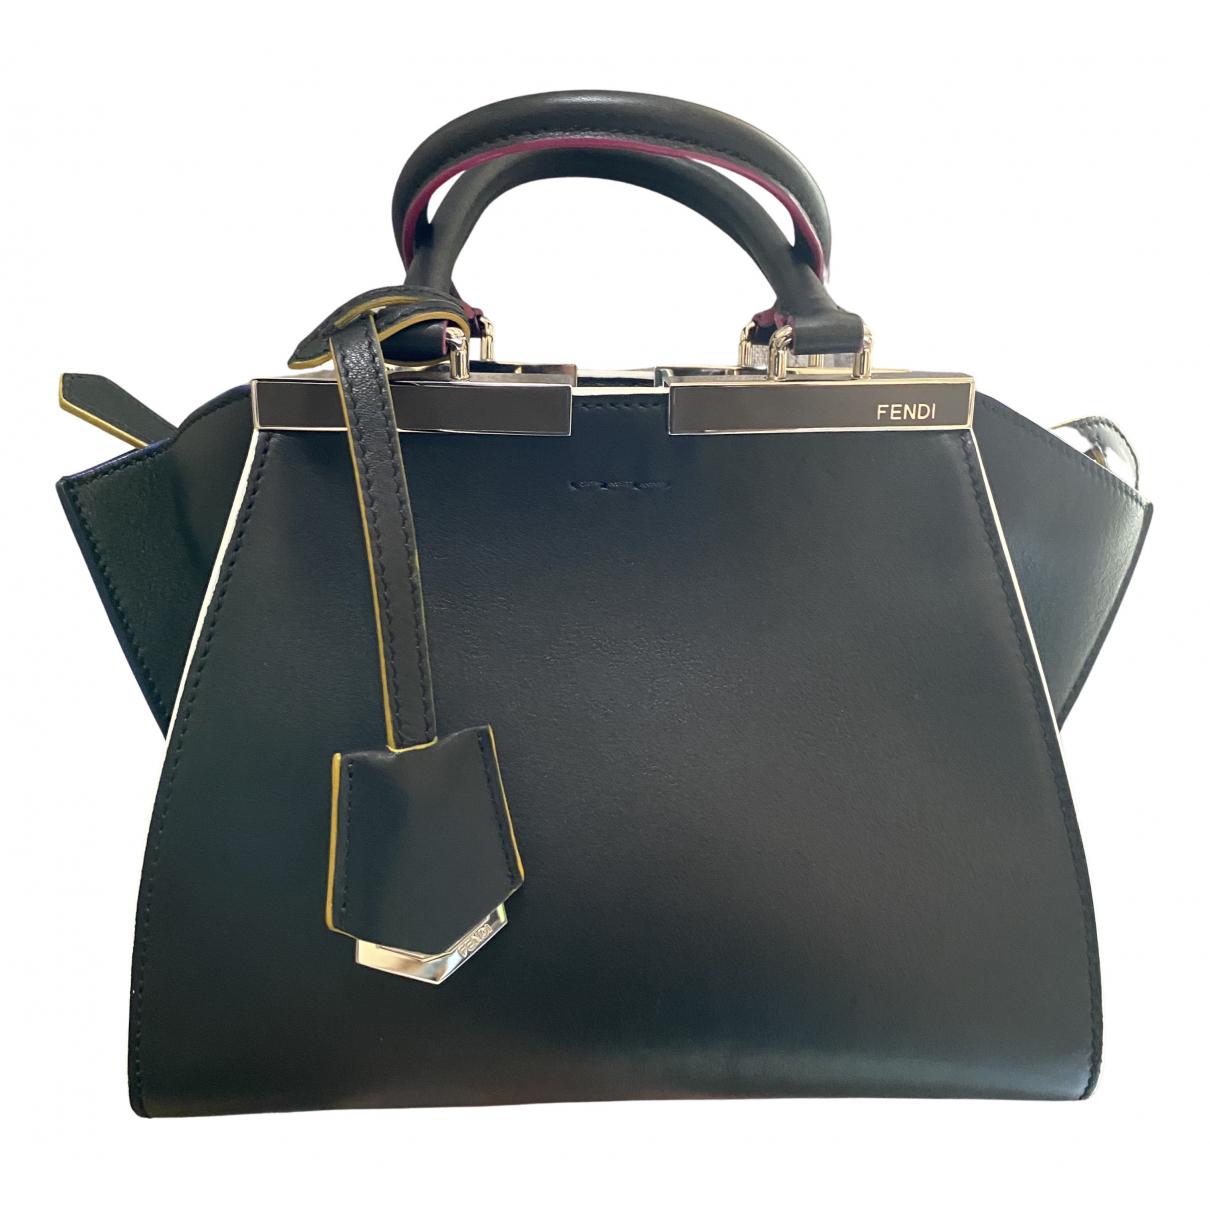 Fendi 3Jours Handtasche in  Schwarz Leder